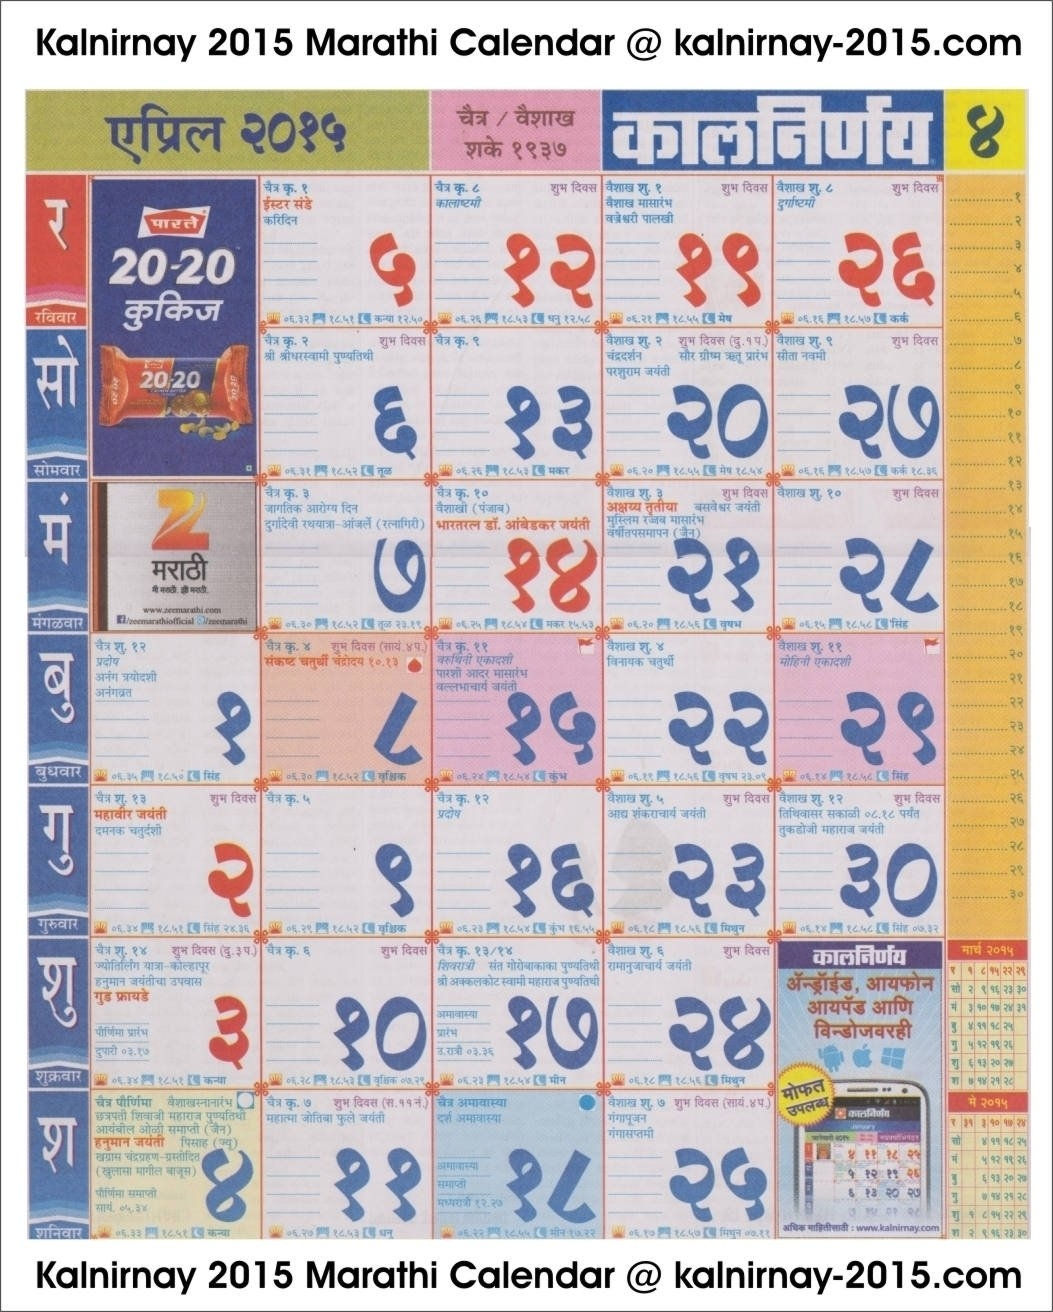 March 2019 Calendar Marathi | Template Calendar Printable Calendar 2019 Kalnirnay March